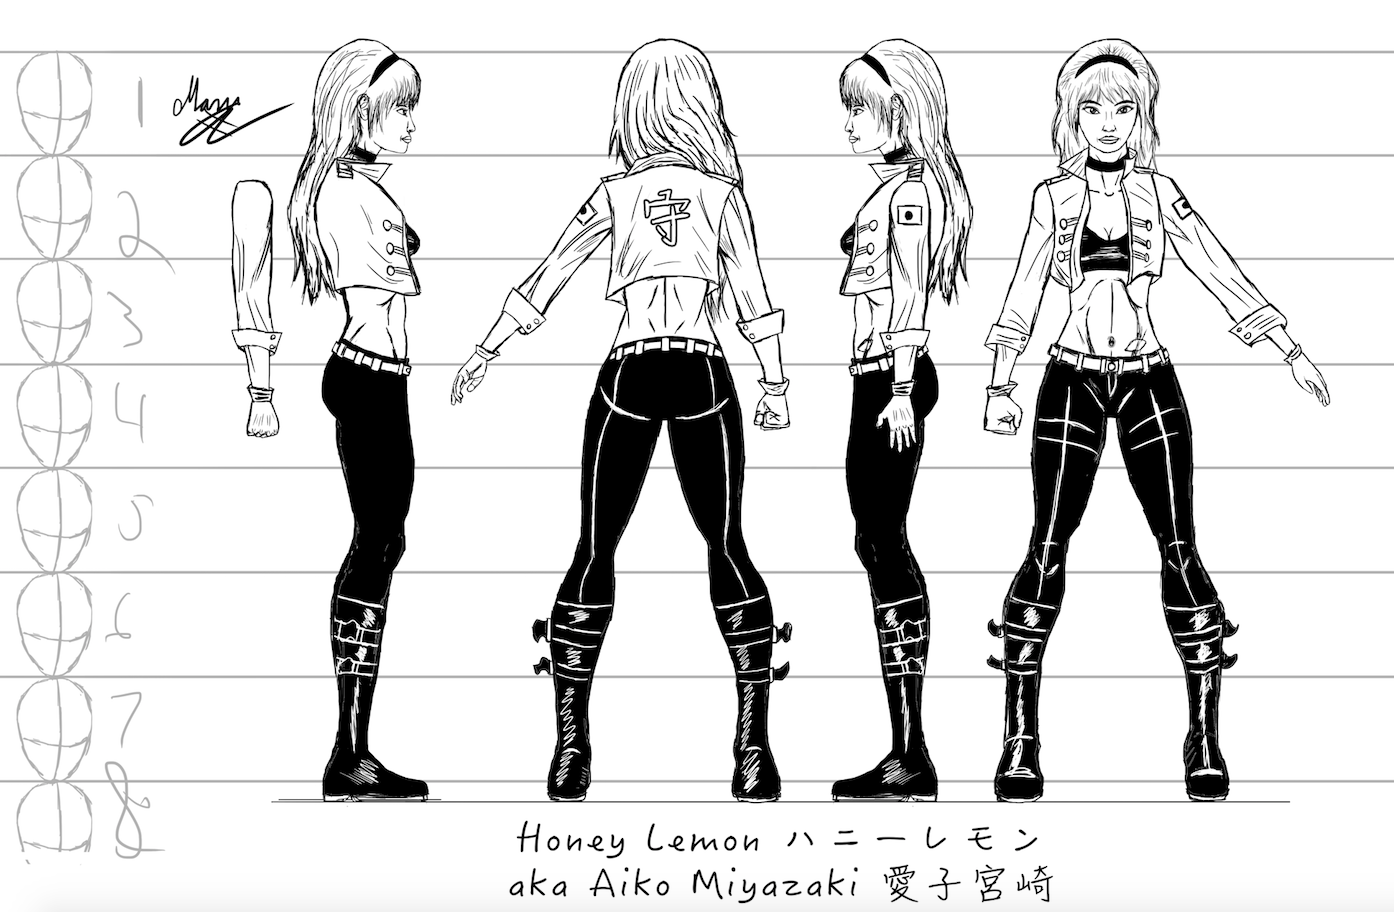 Honey Lemon Character Sheet #2